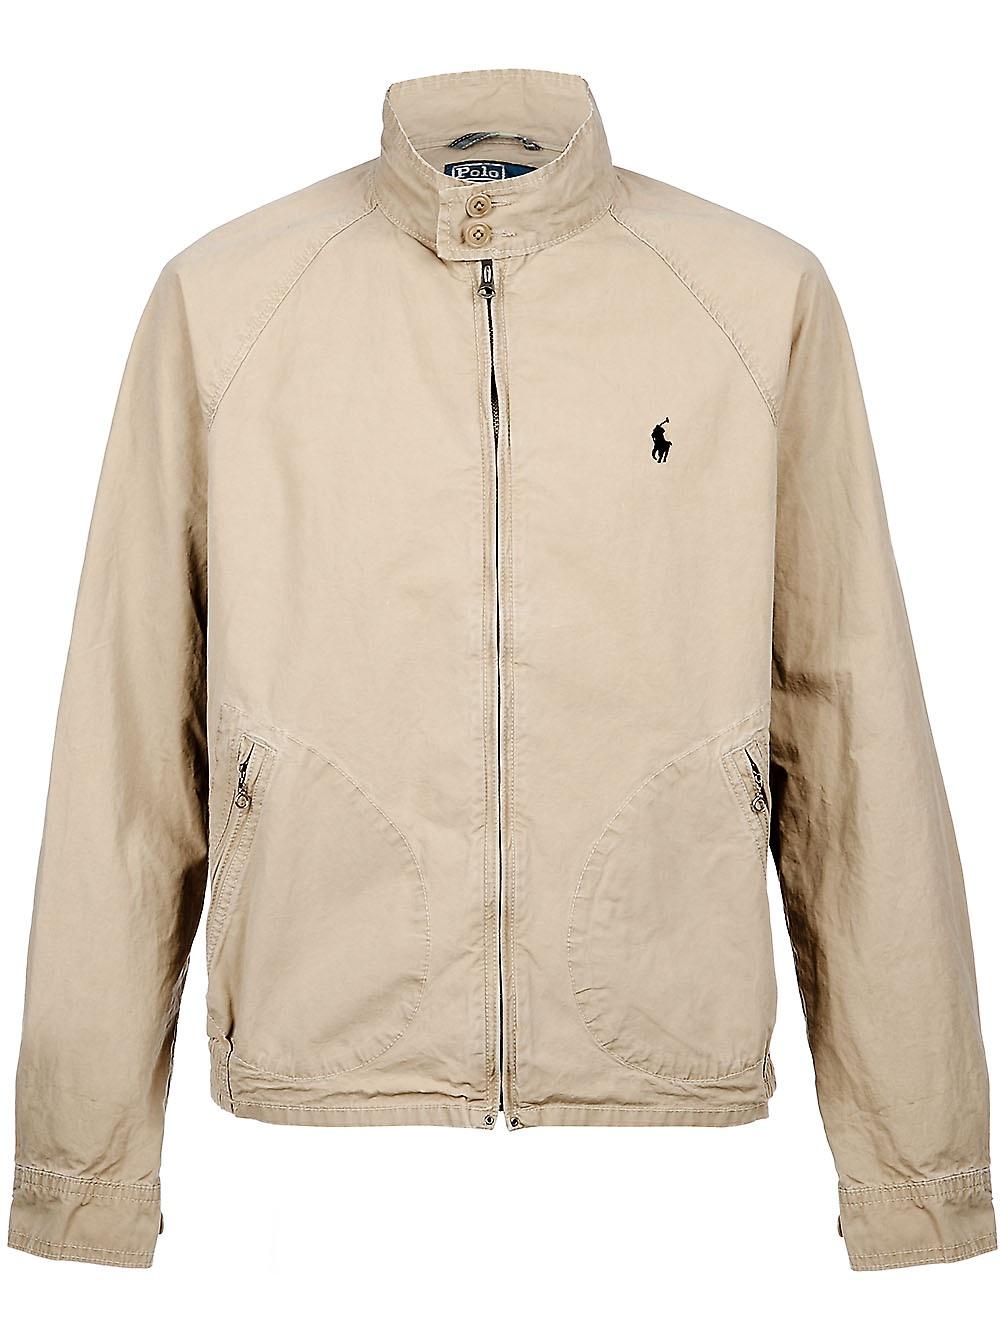 Lyst Polo Ralph Lauren High Neck Jacket In Natural For Men